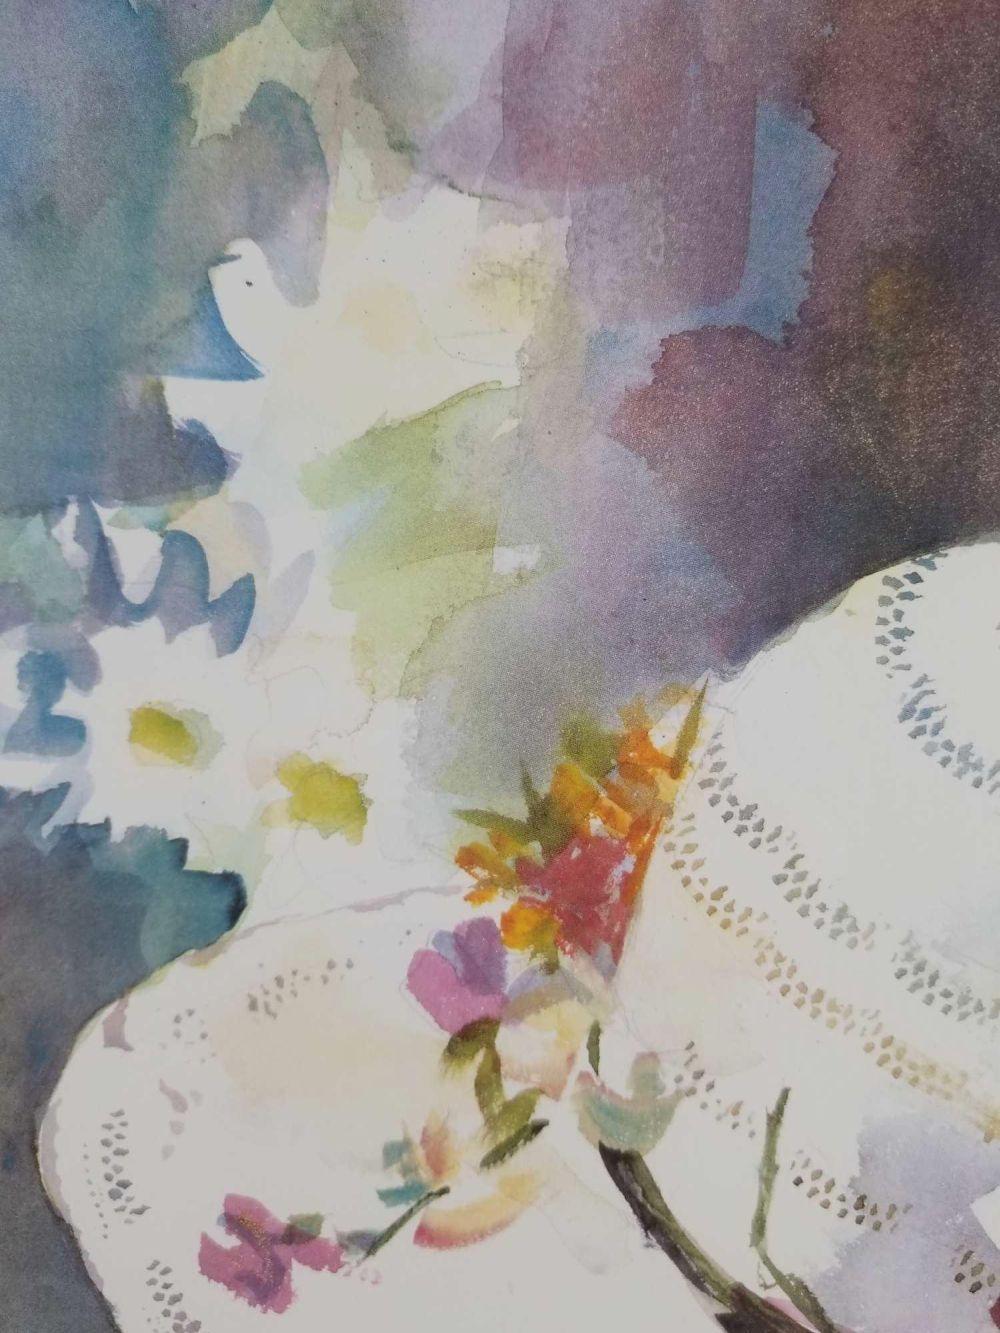 Lot 522: Fine Art Print of Original Watercolor by Judy Bolton Jarrett Signed